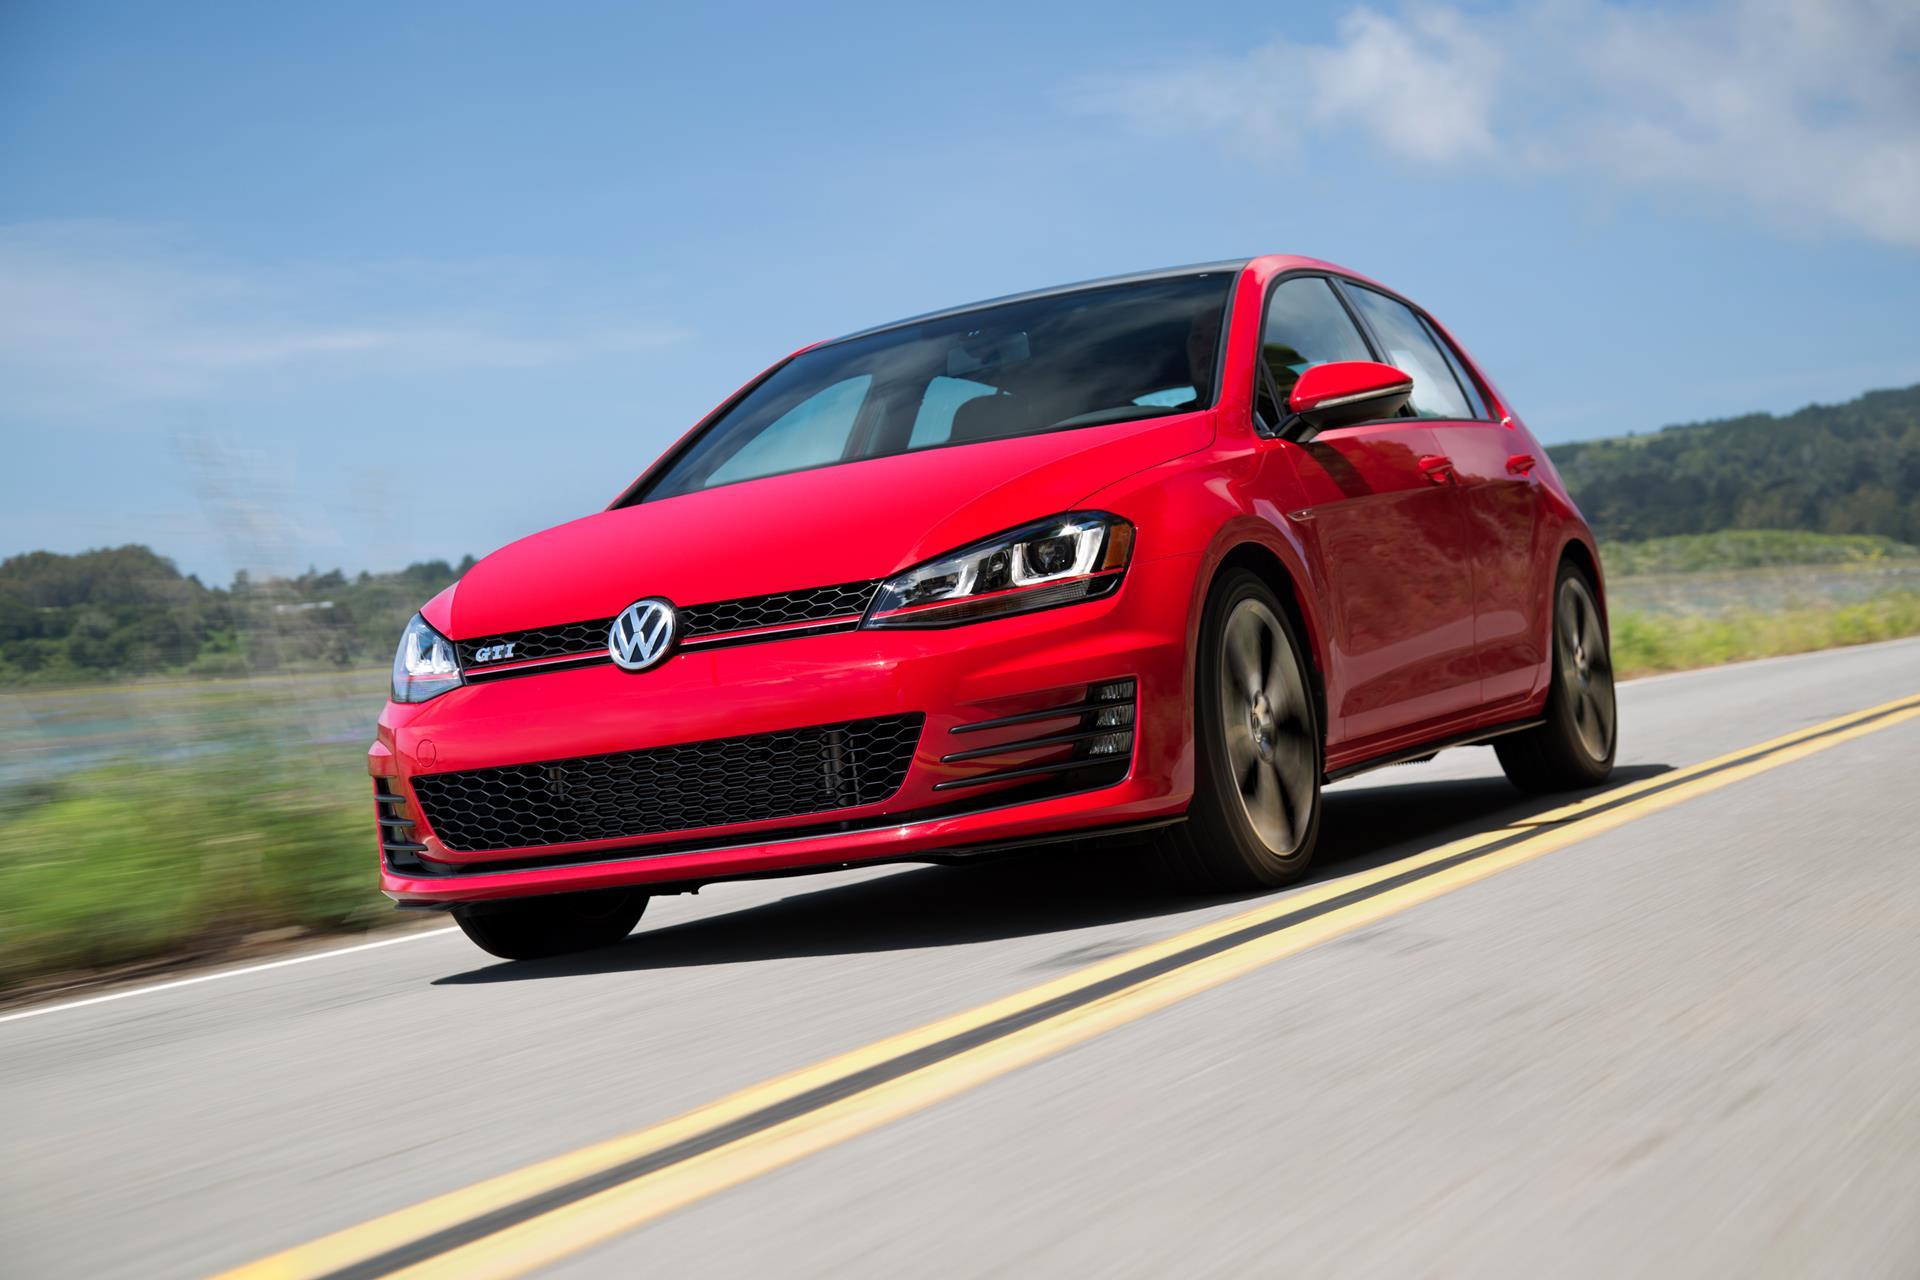 2016 Volkswagen Golf GTI News And Information